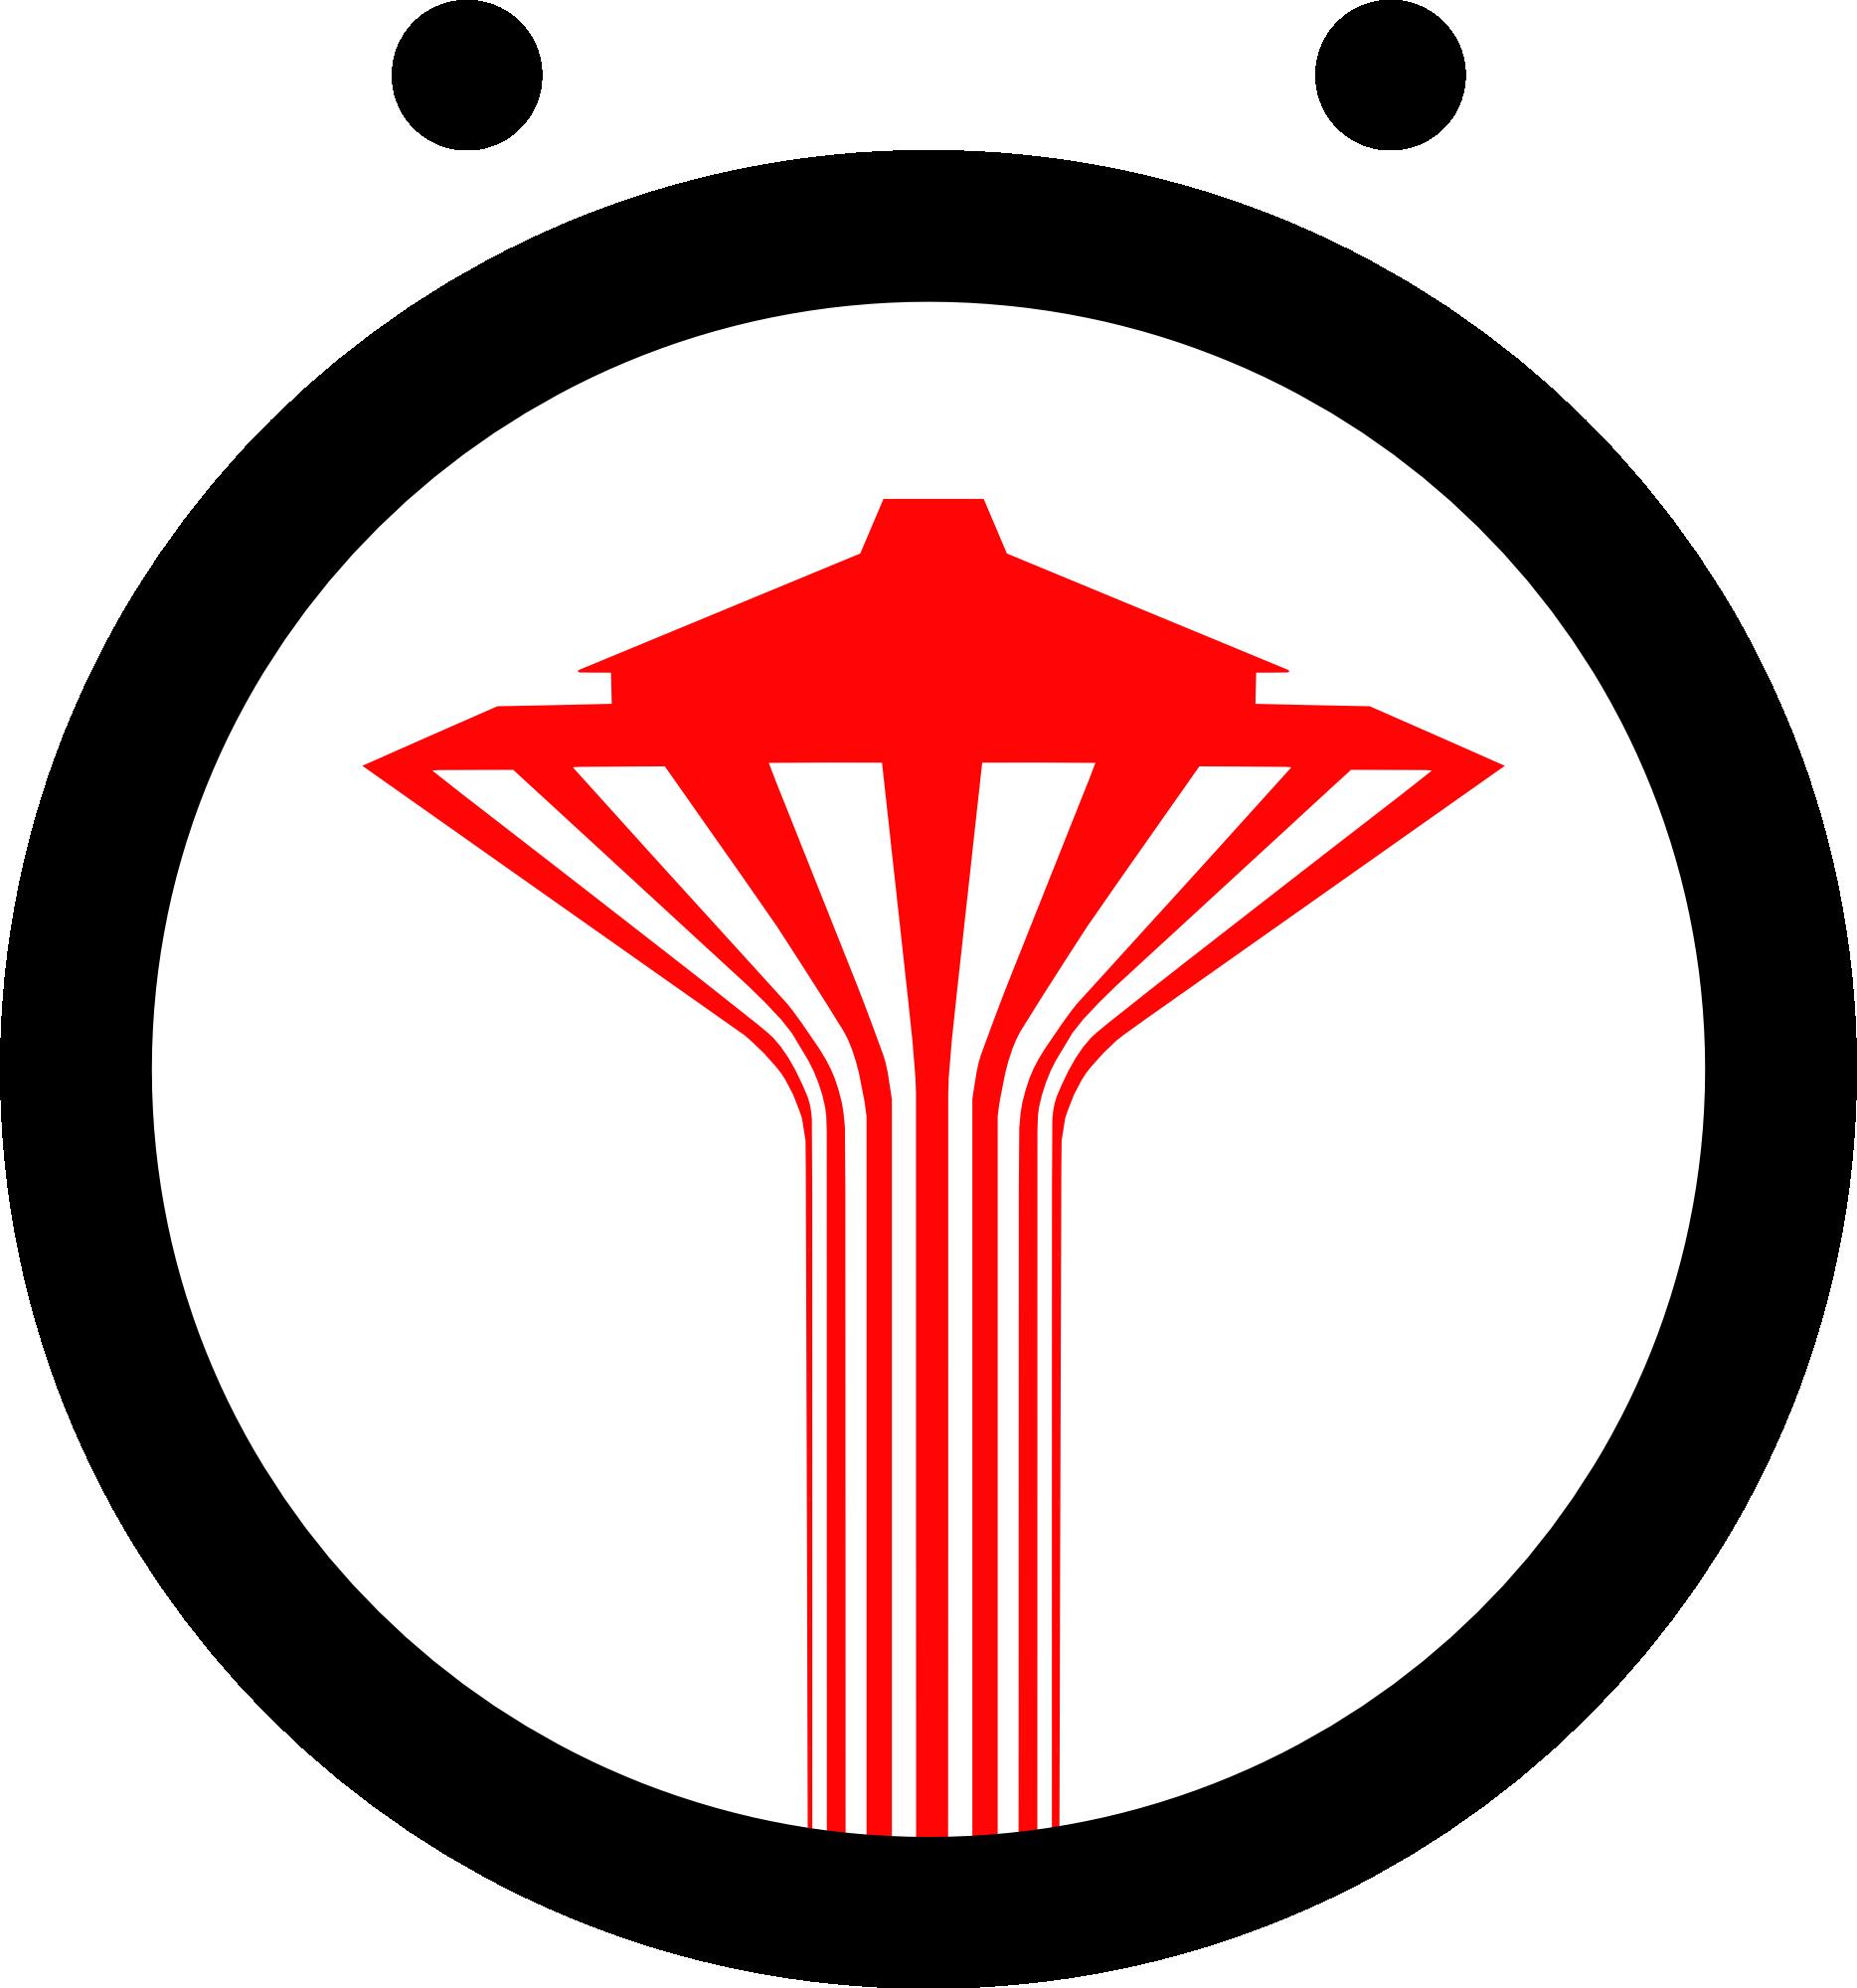 öp logotyp